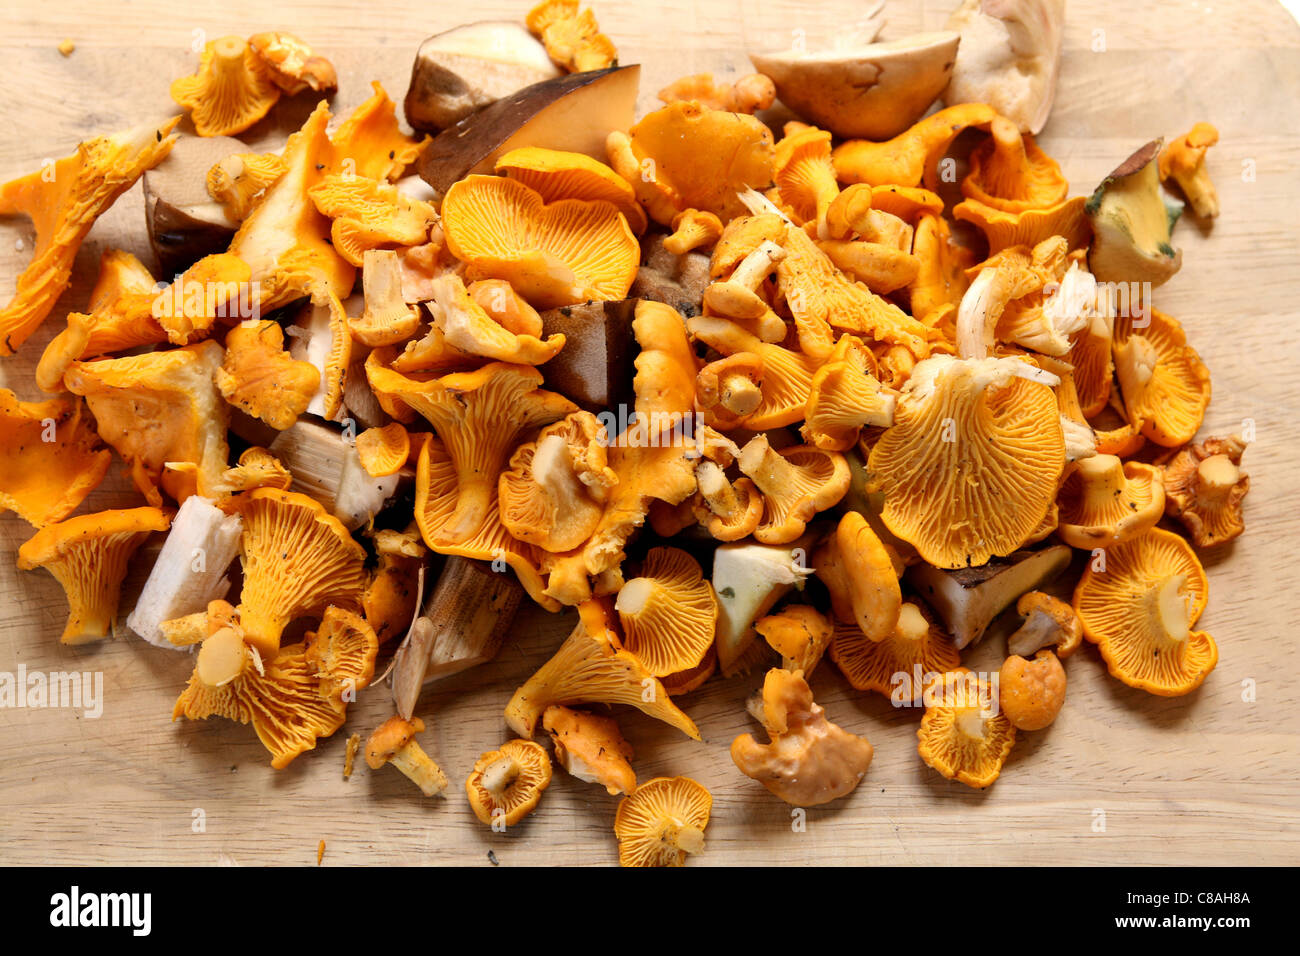 Heap of chanterelles and boletus mushrooms - Stock Image